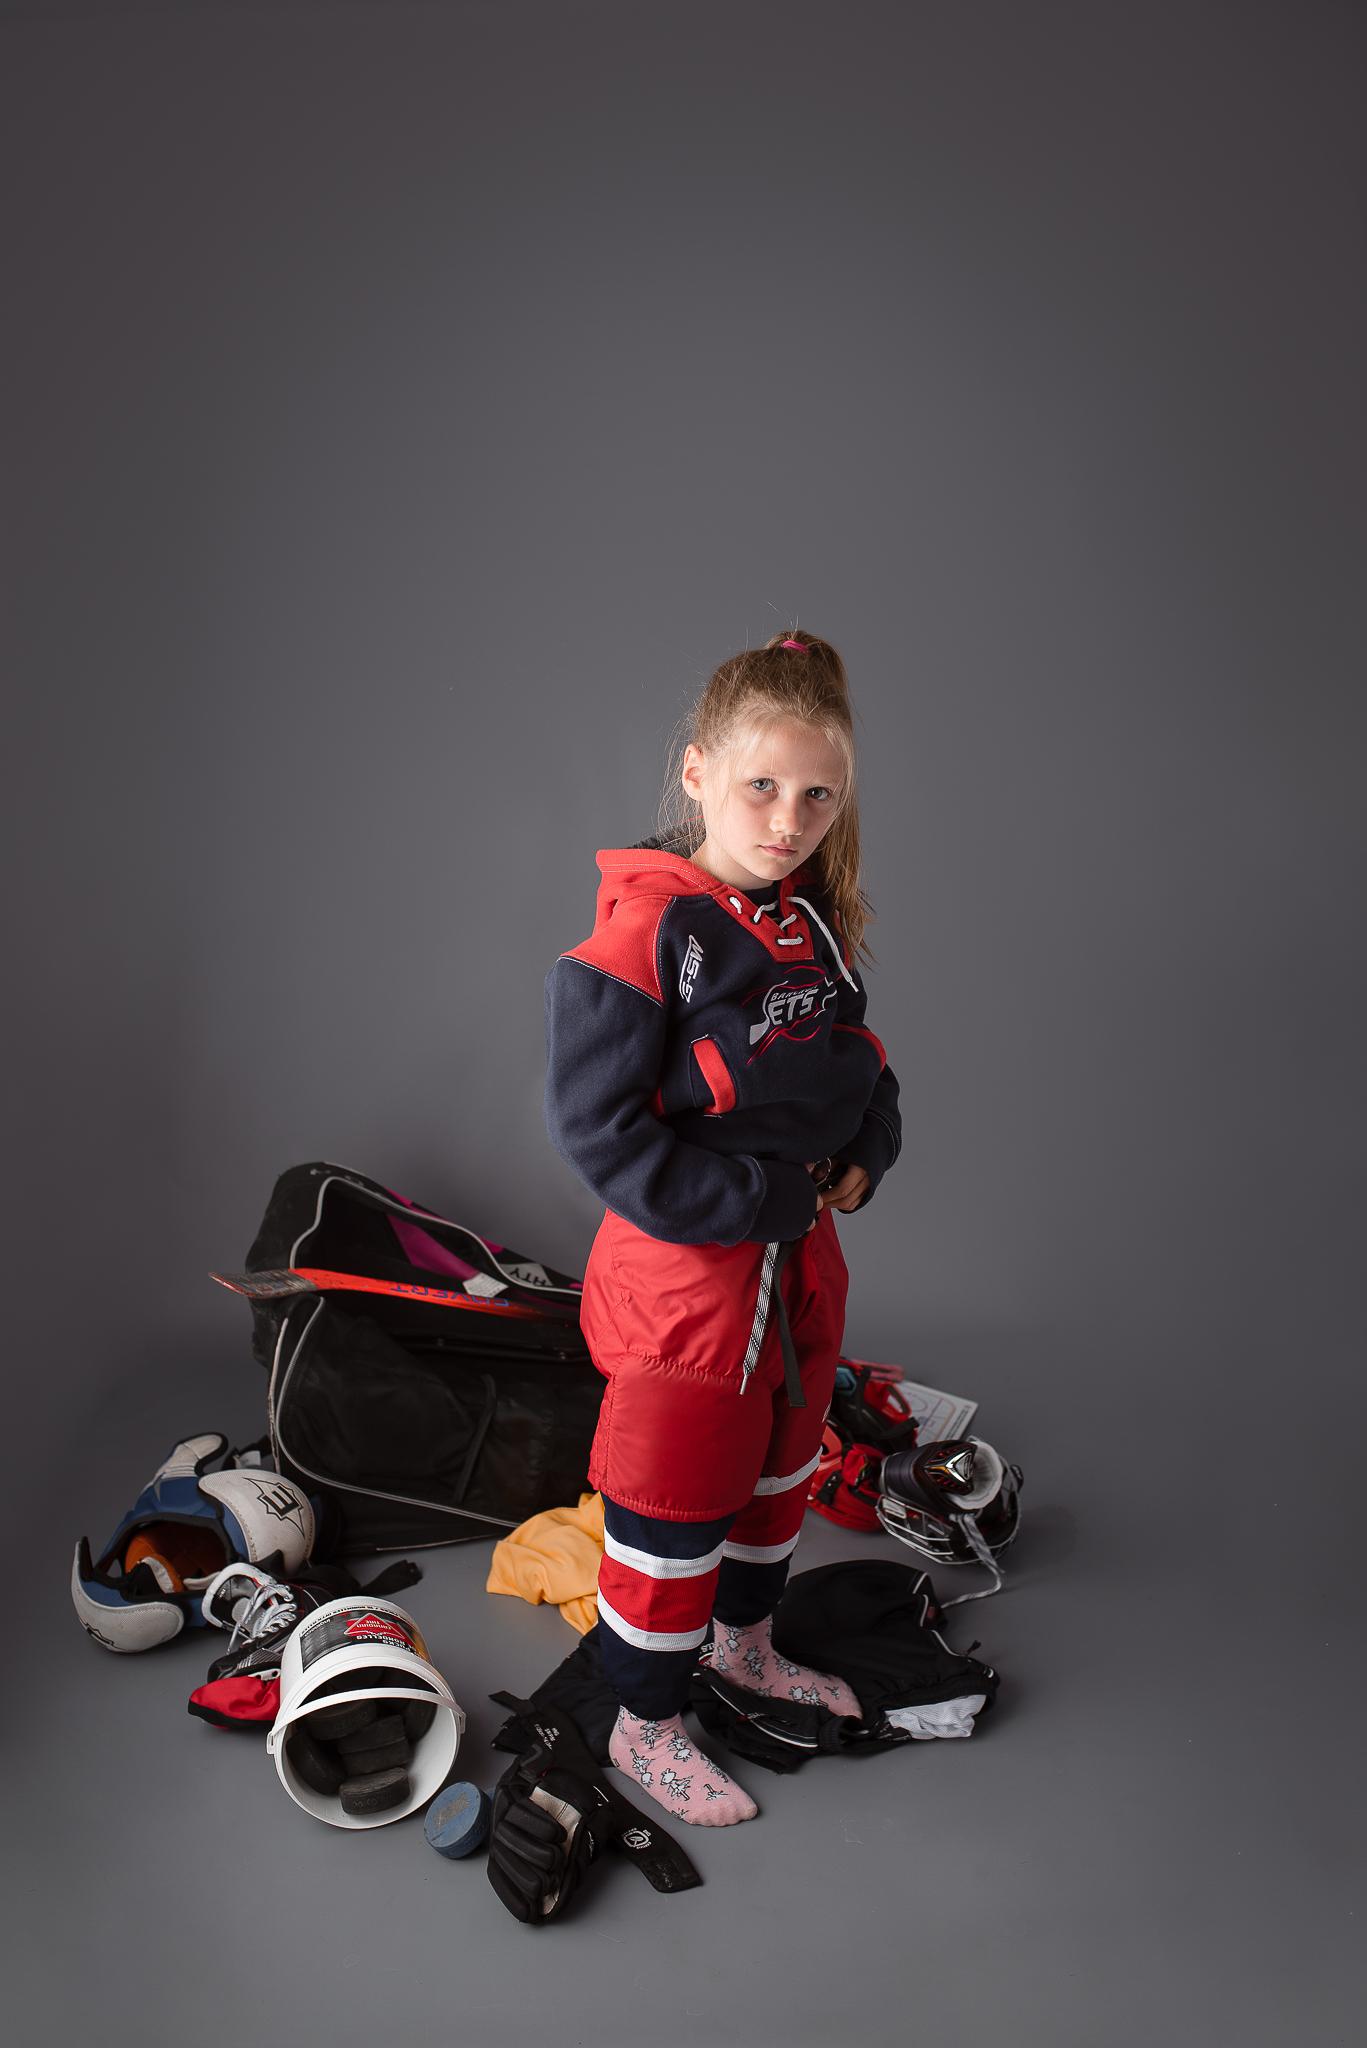 Naomi Lucienne Peterborough Photography Portrait Photography Children Photography Family Photography-17.jpg